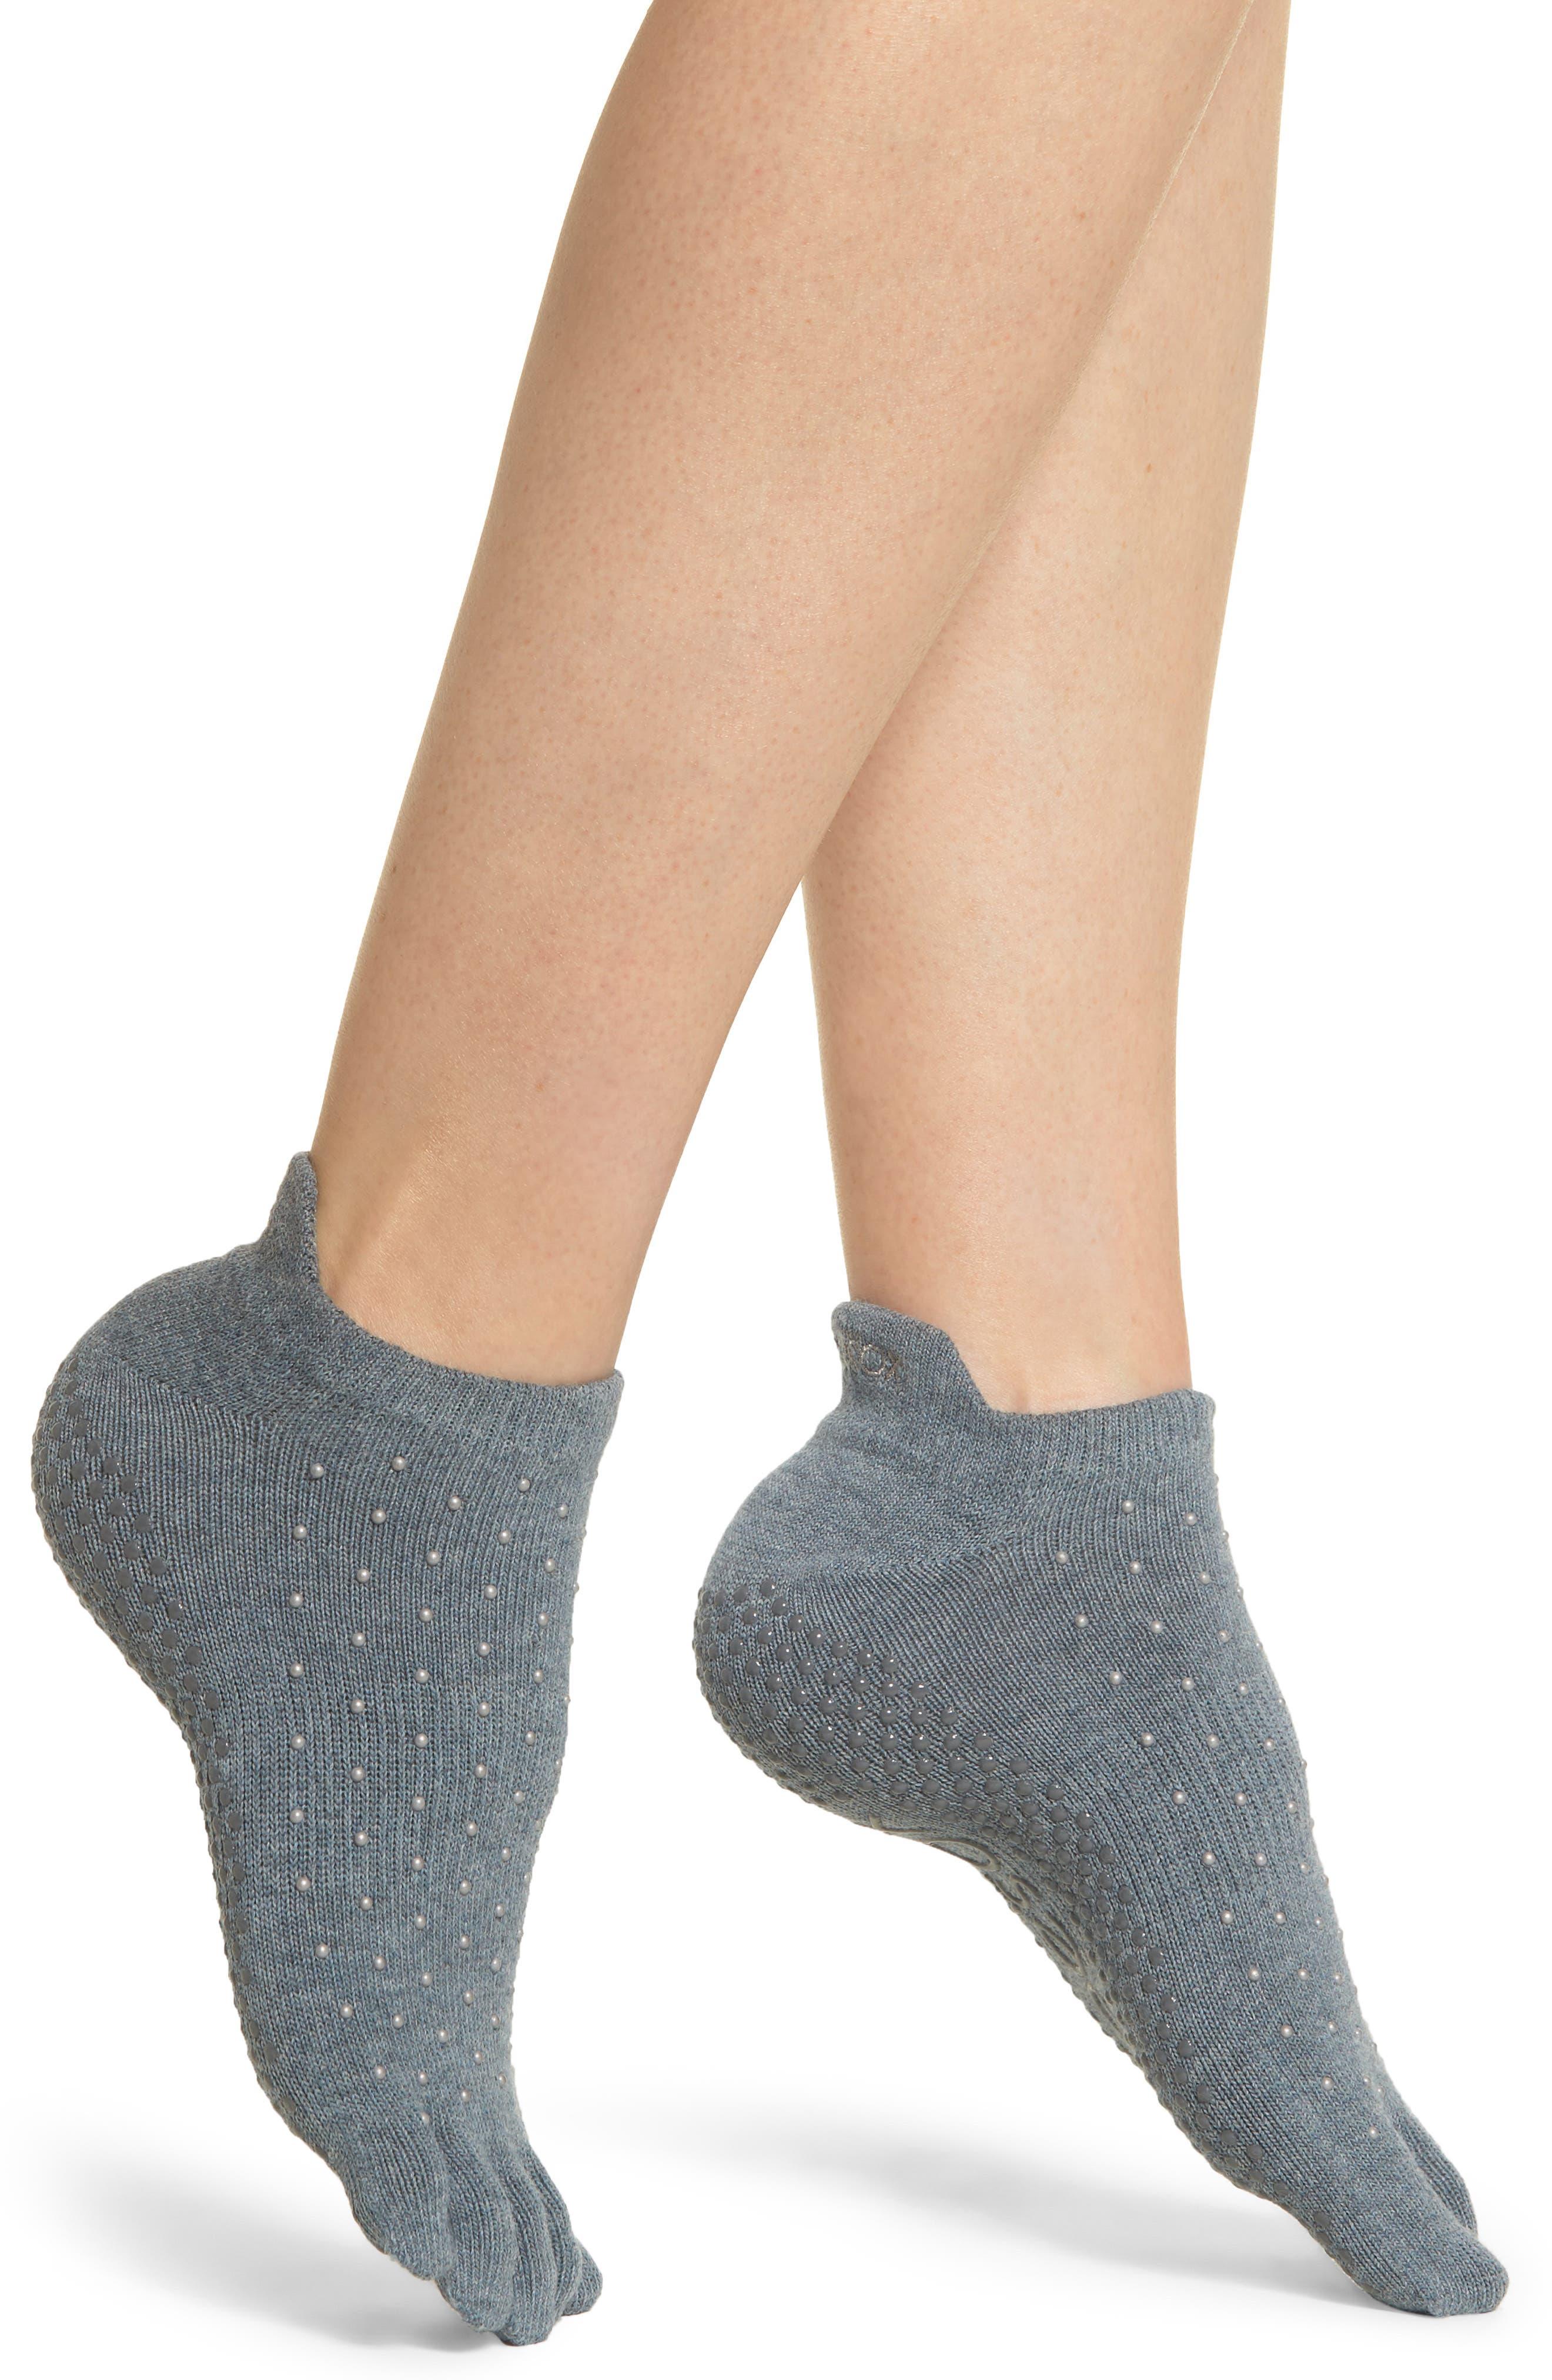 TOESOX Full Toe Gripper Socks in Baltic